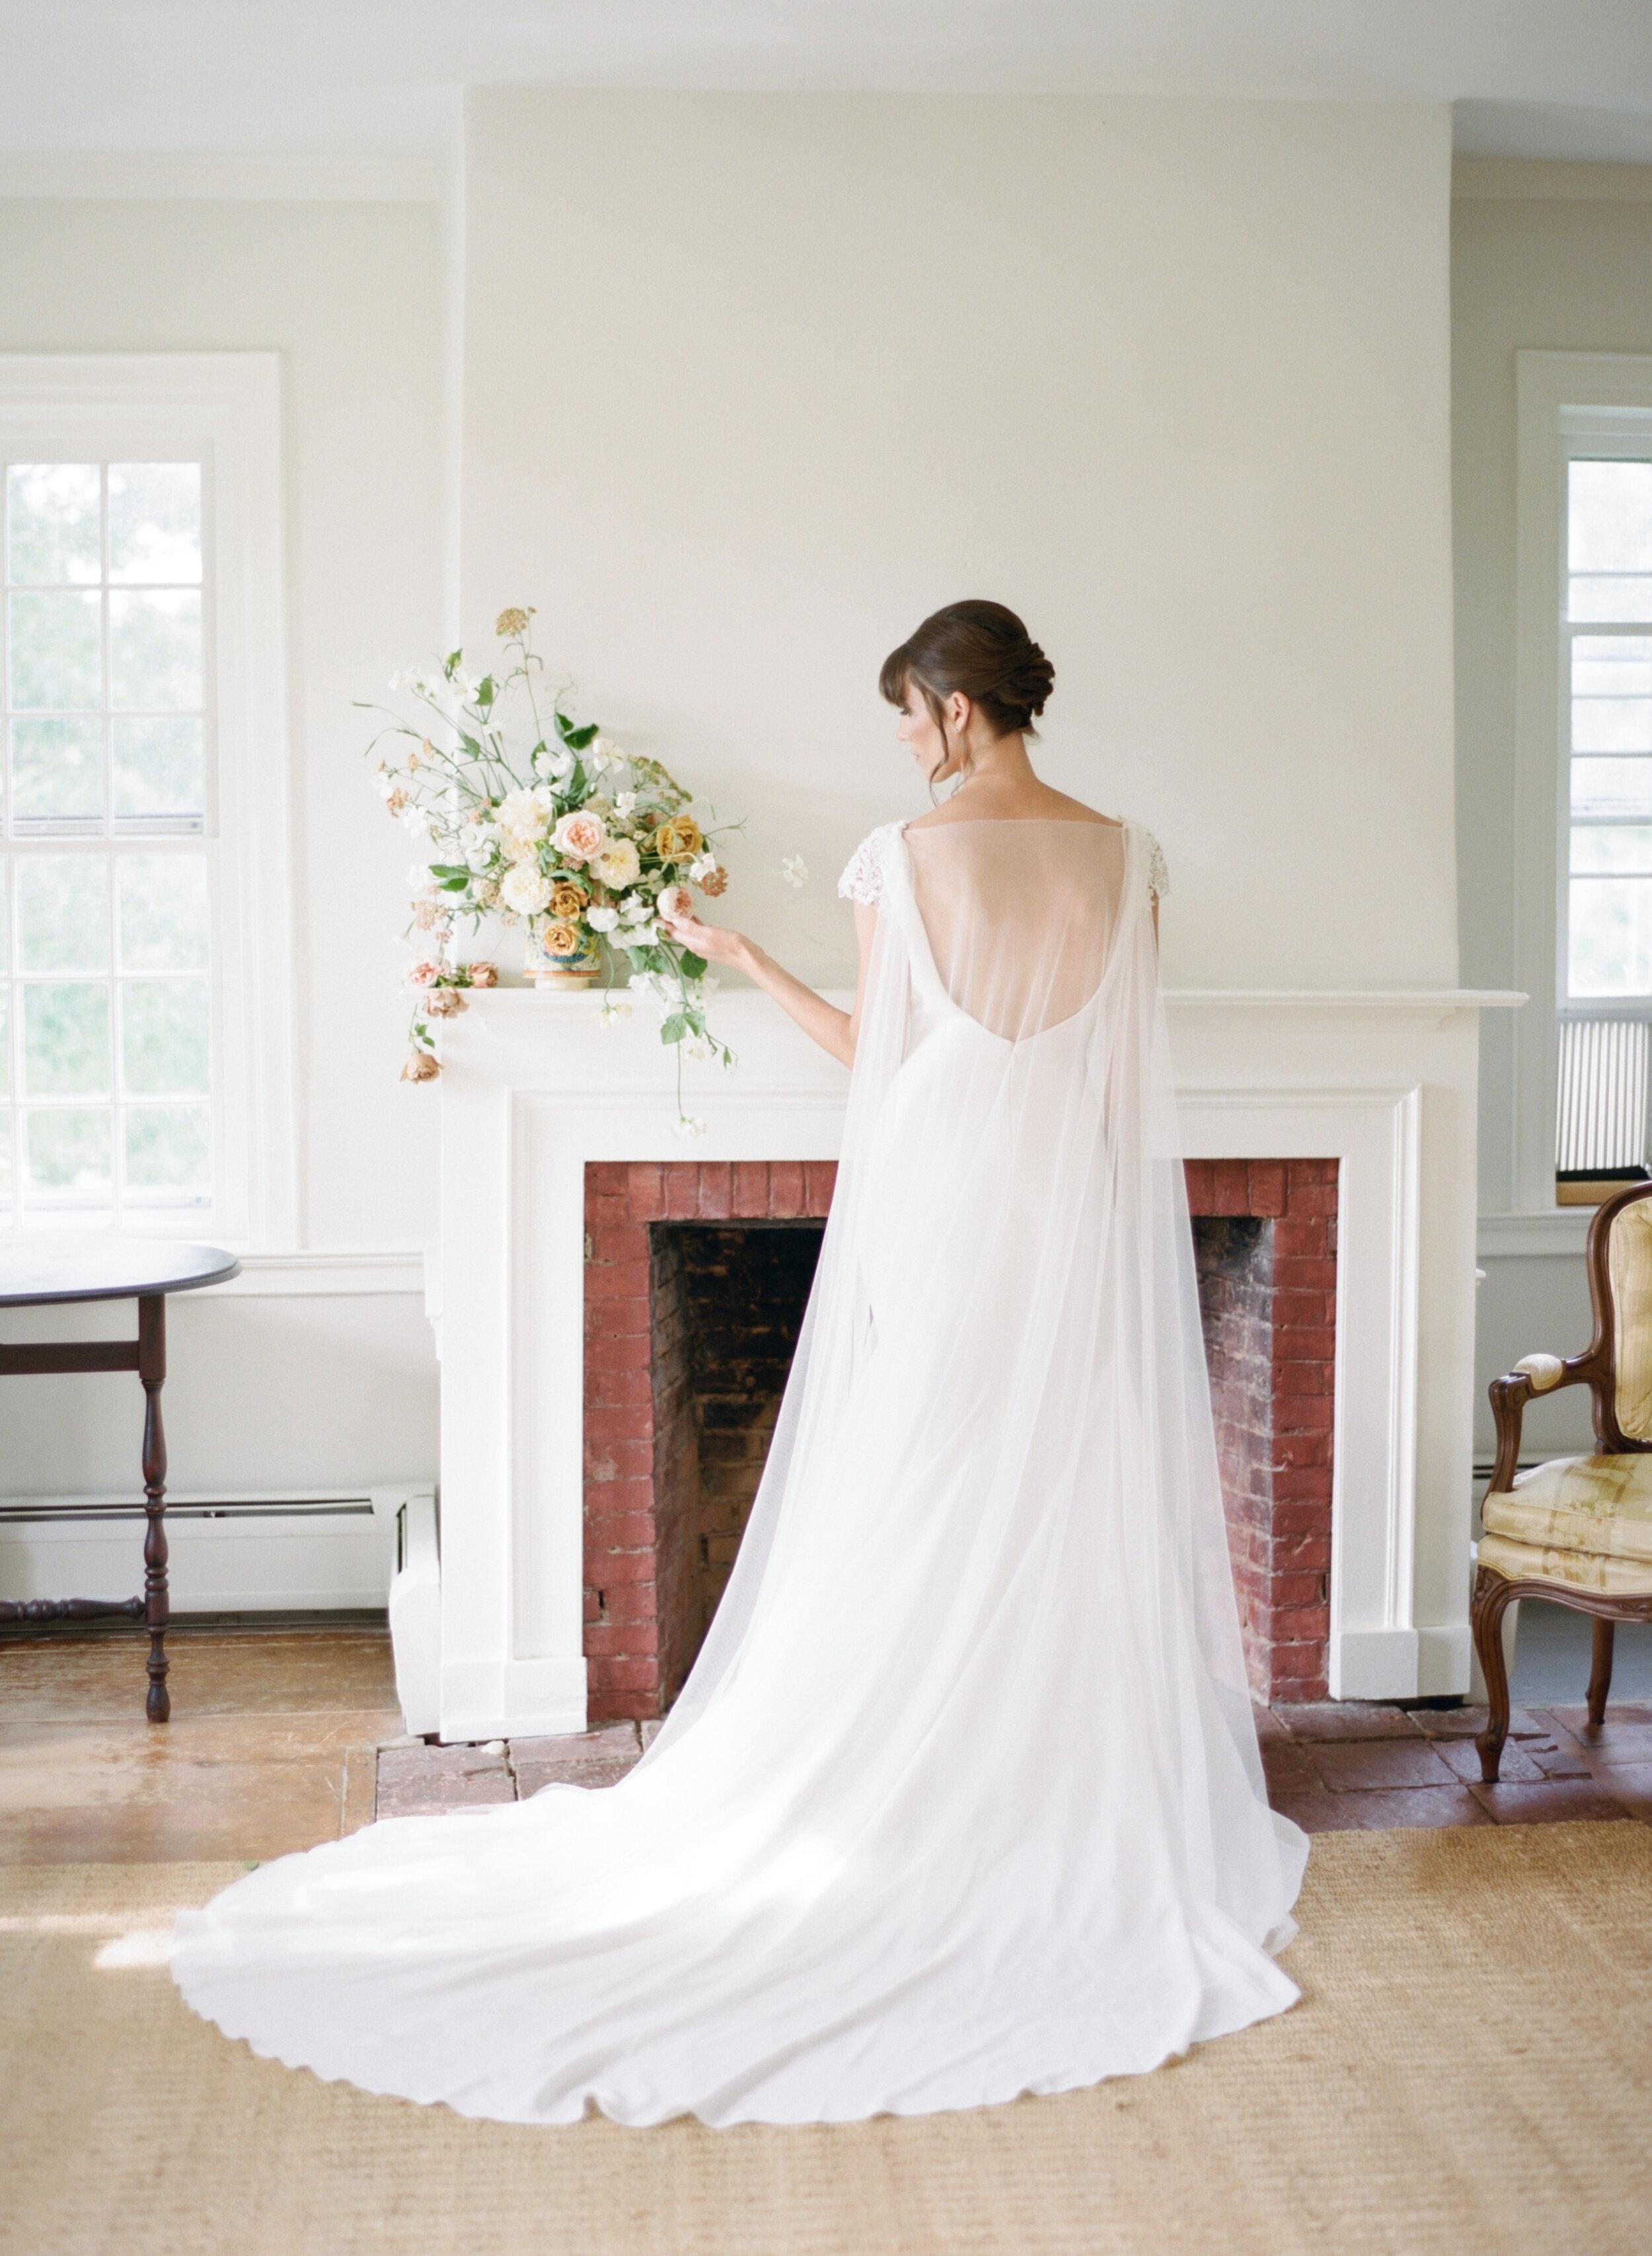 alexandra-meseke-understated-soft-luxury-wedding-upstate-ny_0042.jpg